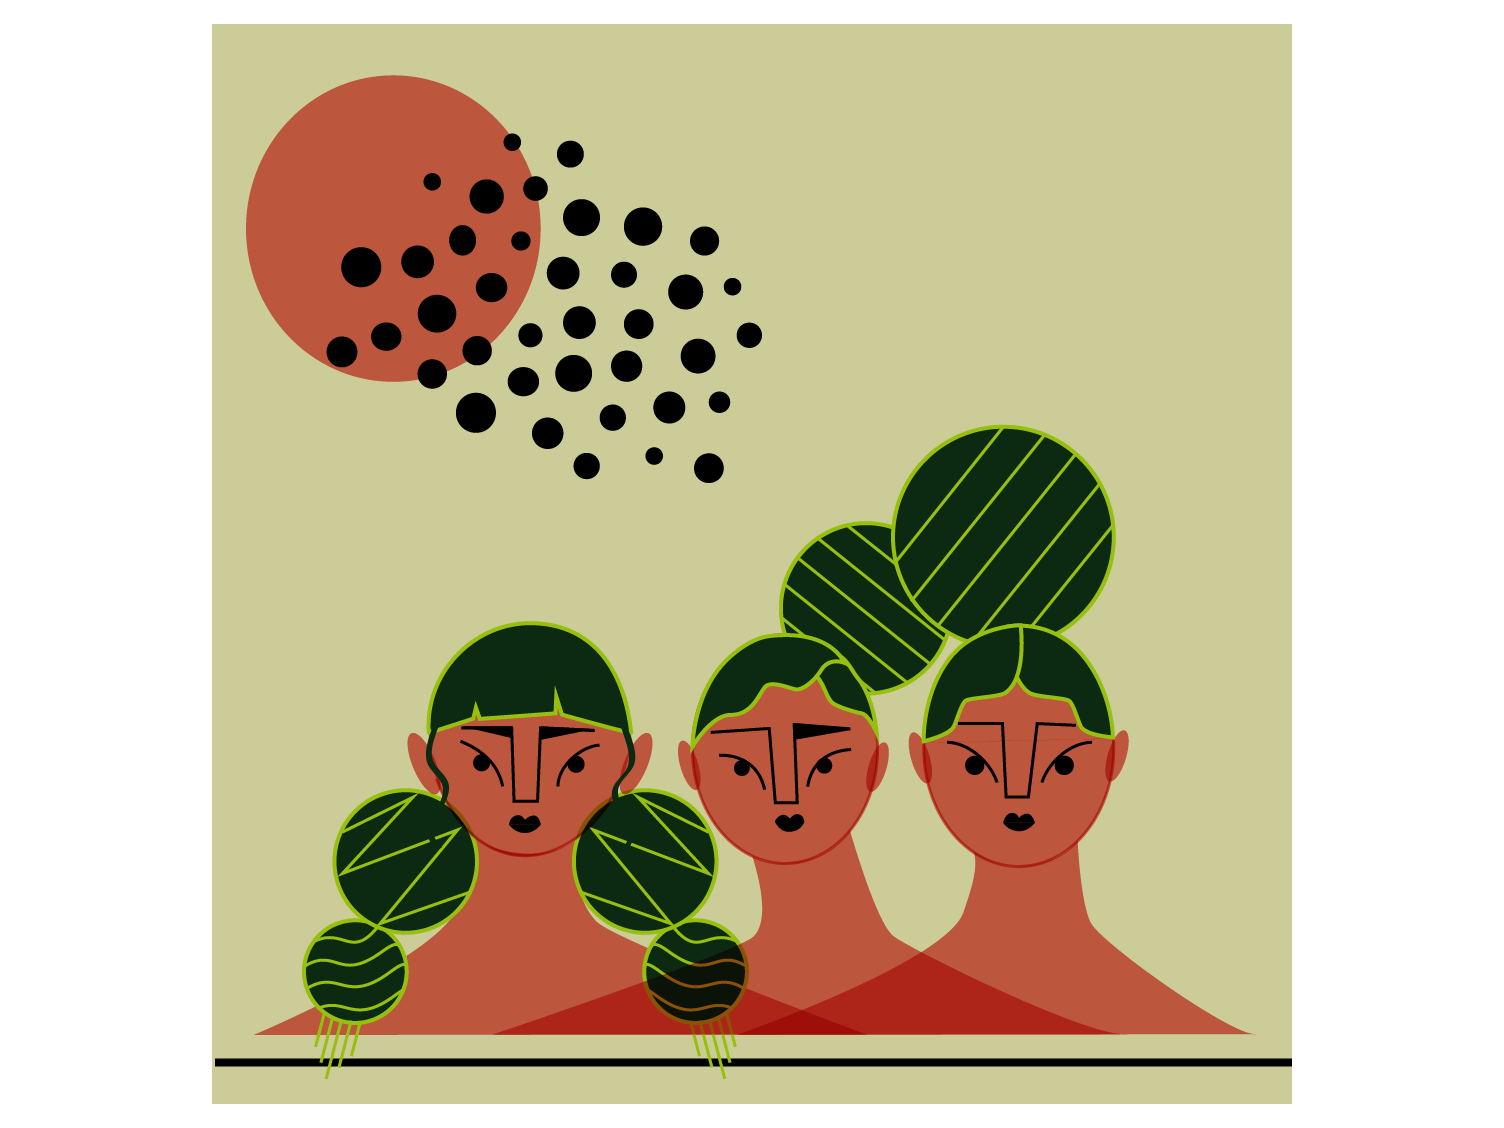 Watermelon Girls lineart editorial art watermelon editorial illustration editorial sun poster illustrator graphic design flat  design design artwork artist character concept woman vector character art illustration